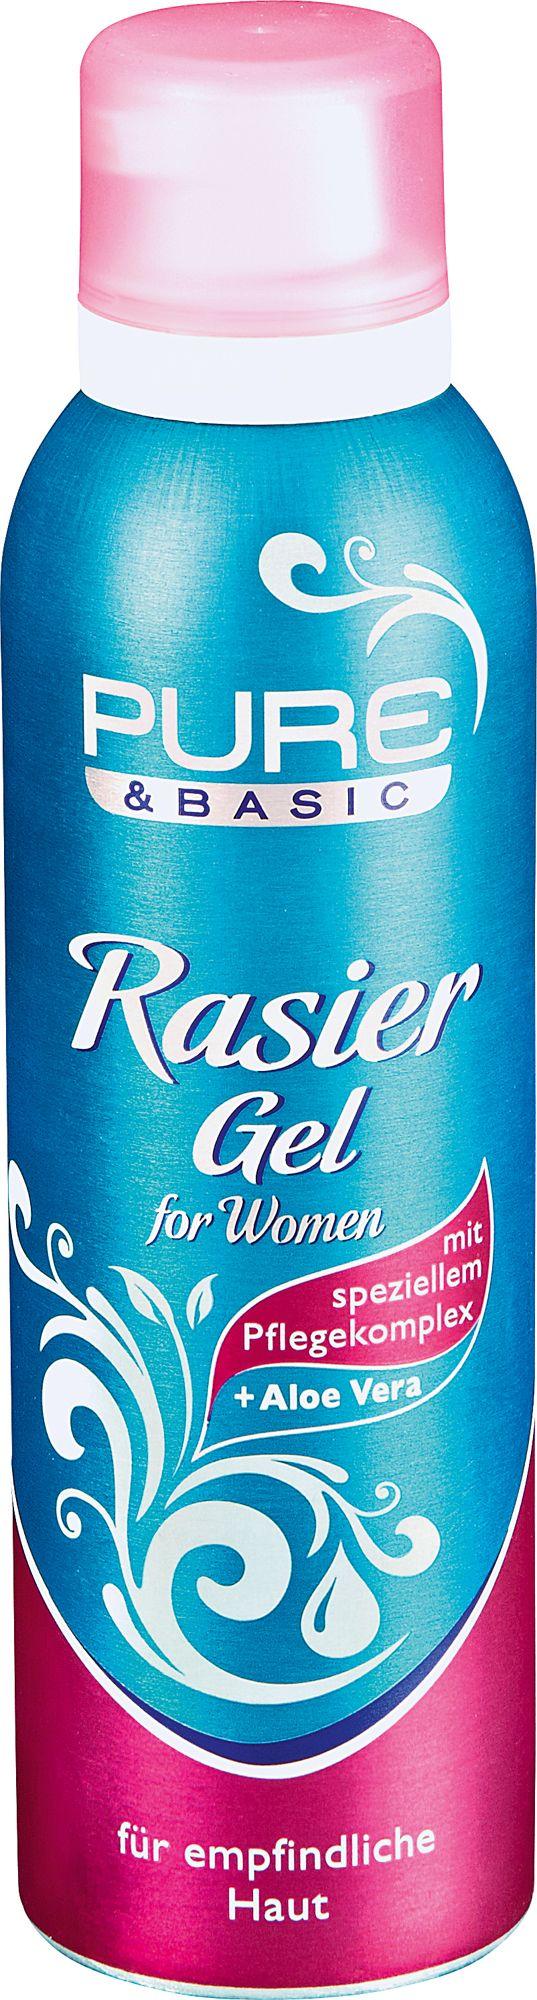 Pure & Basic Rasiergel women